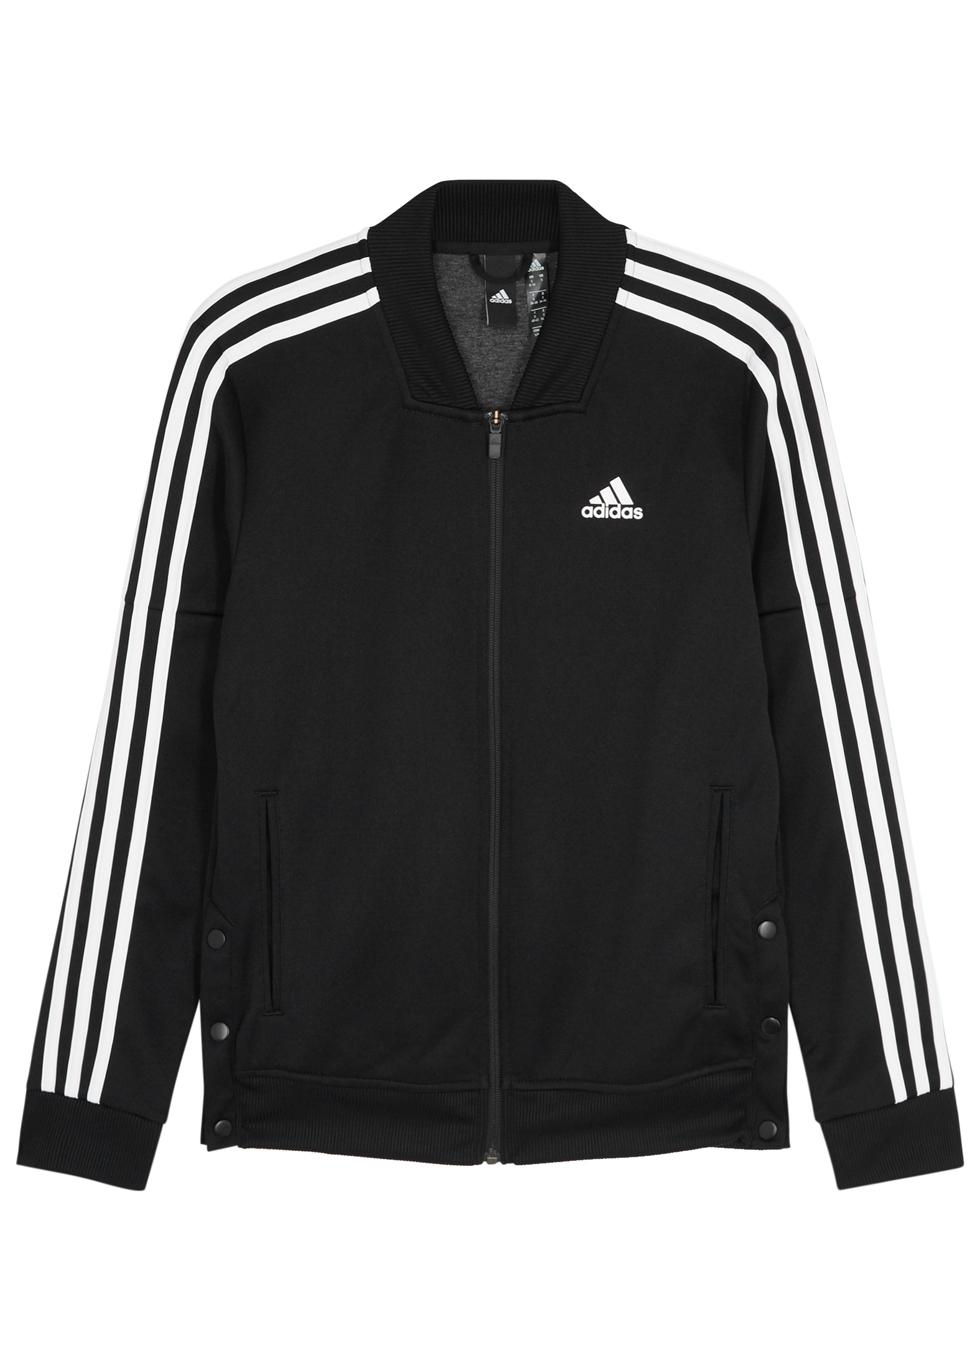 ADIDAS TRAINING Adidas Training Snap Track Black Jersey Sweatshirt in Black And White